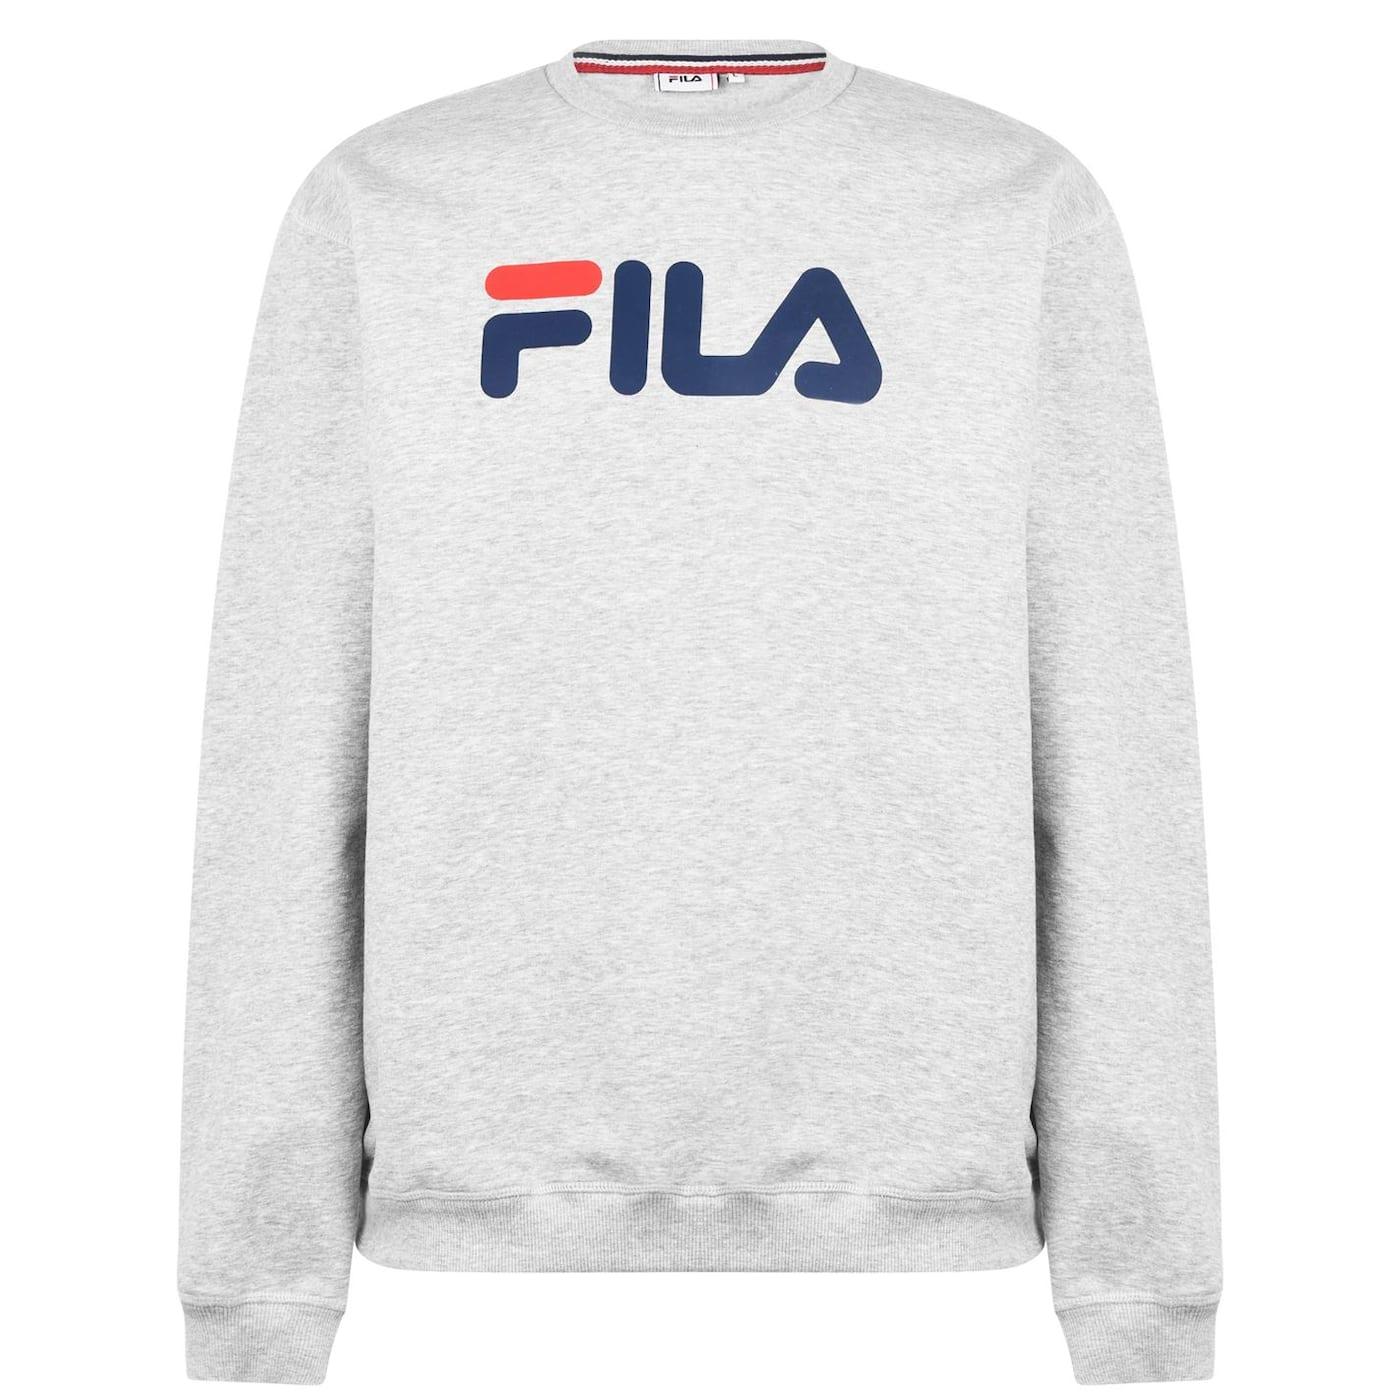 Fila Urban Sweatshirt Mens